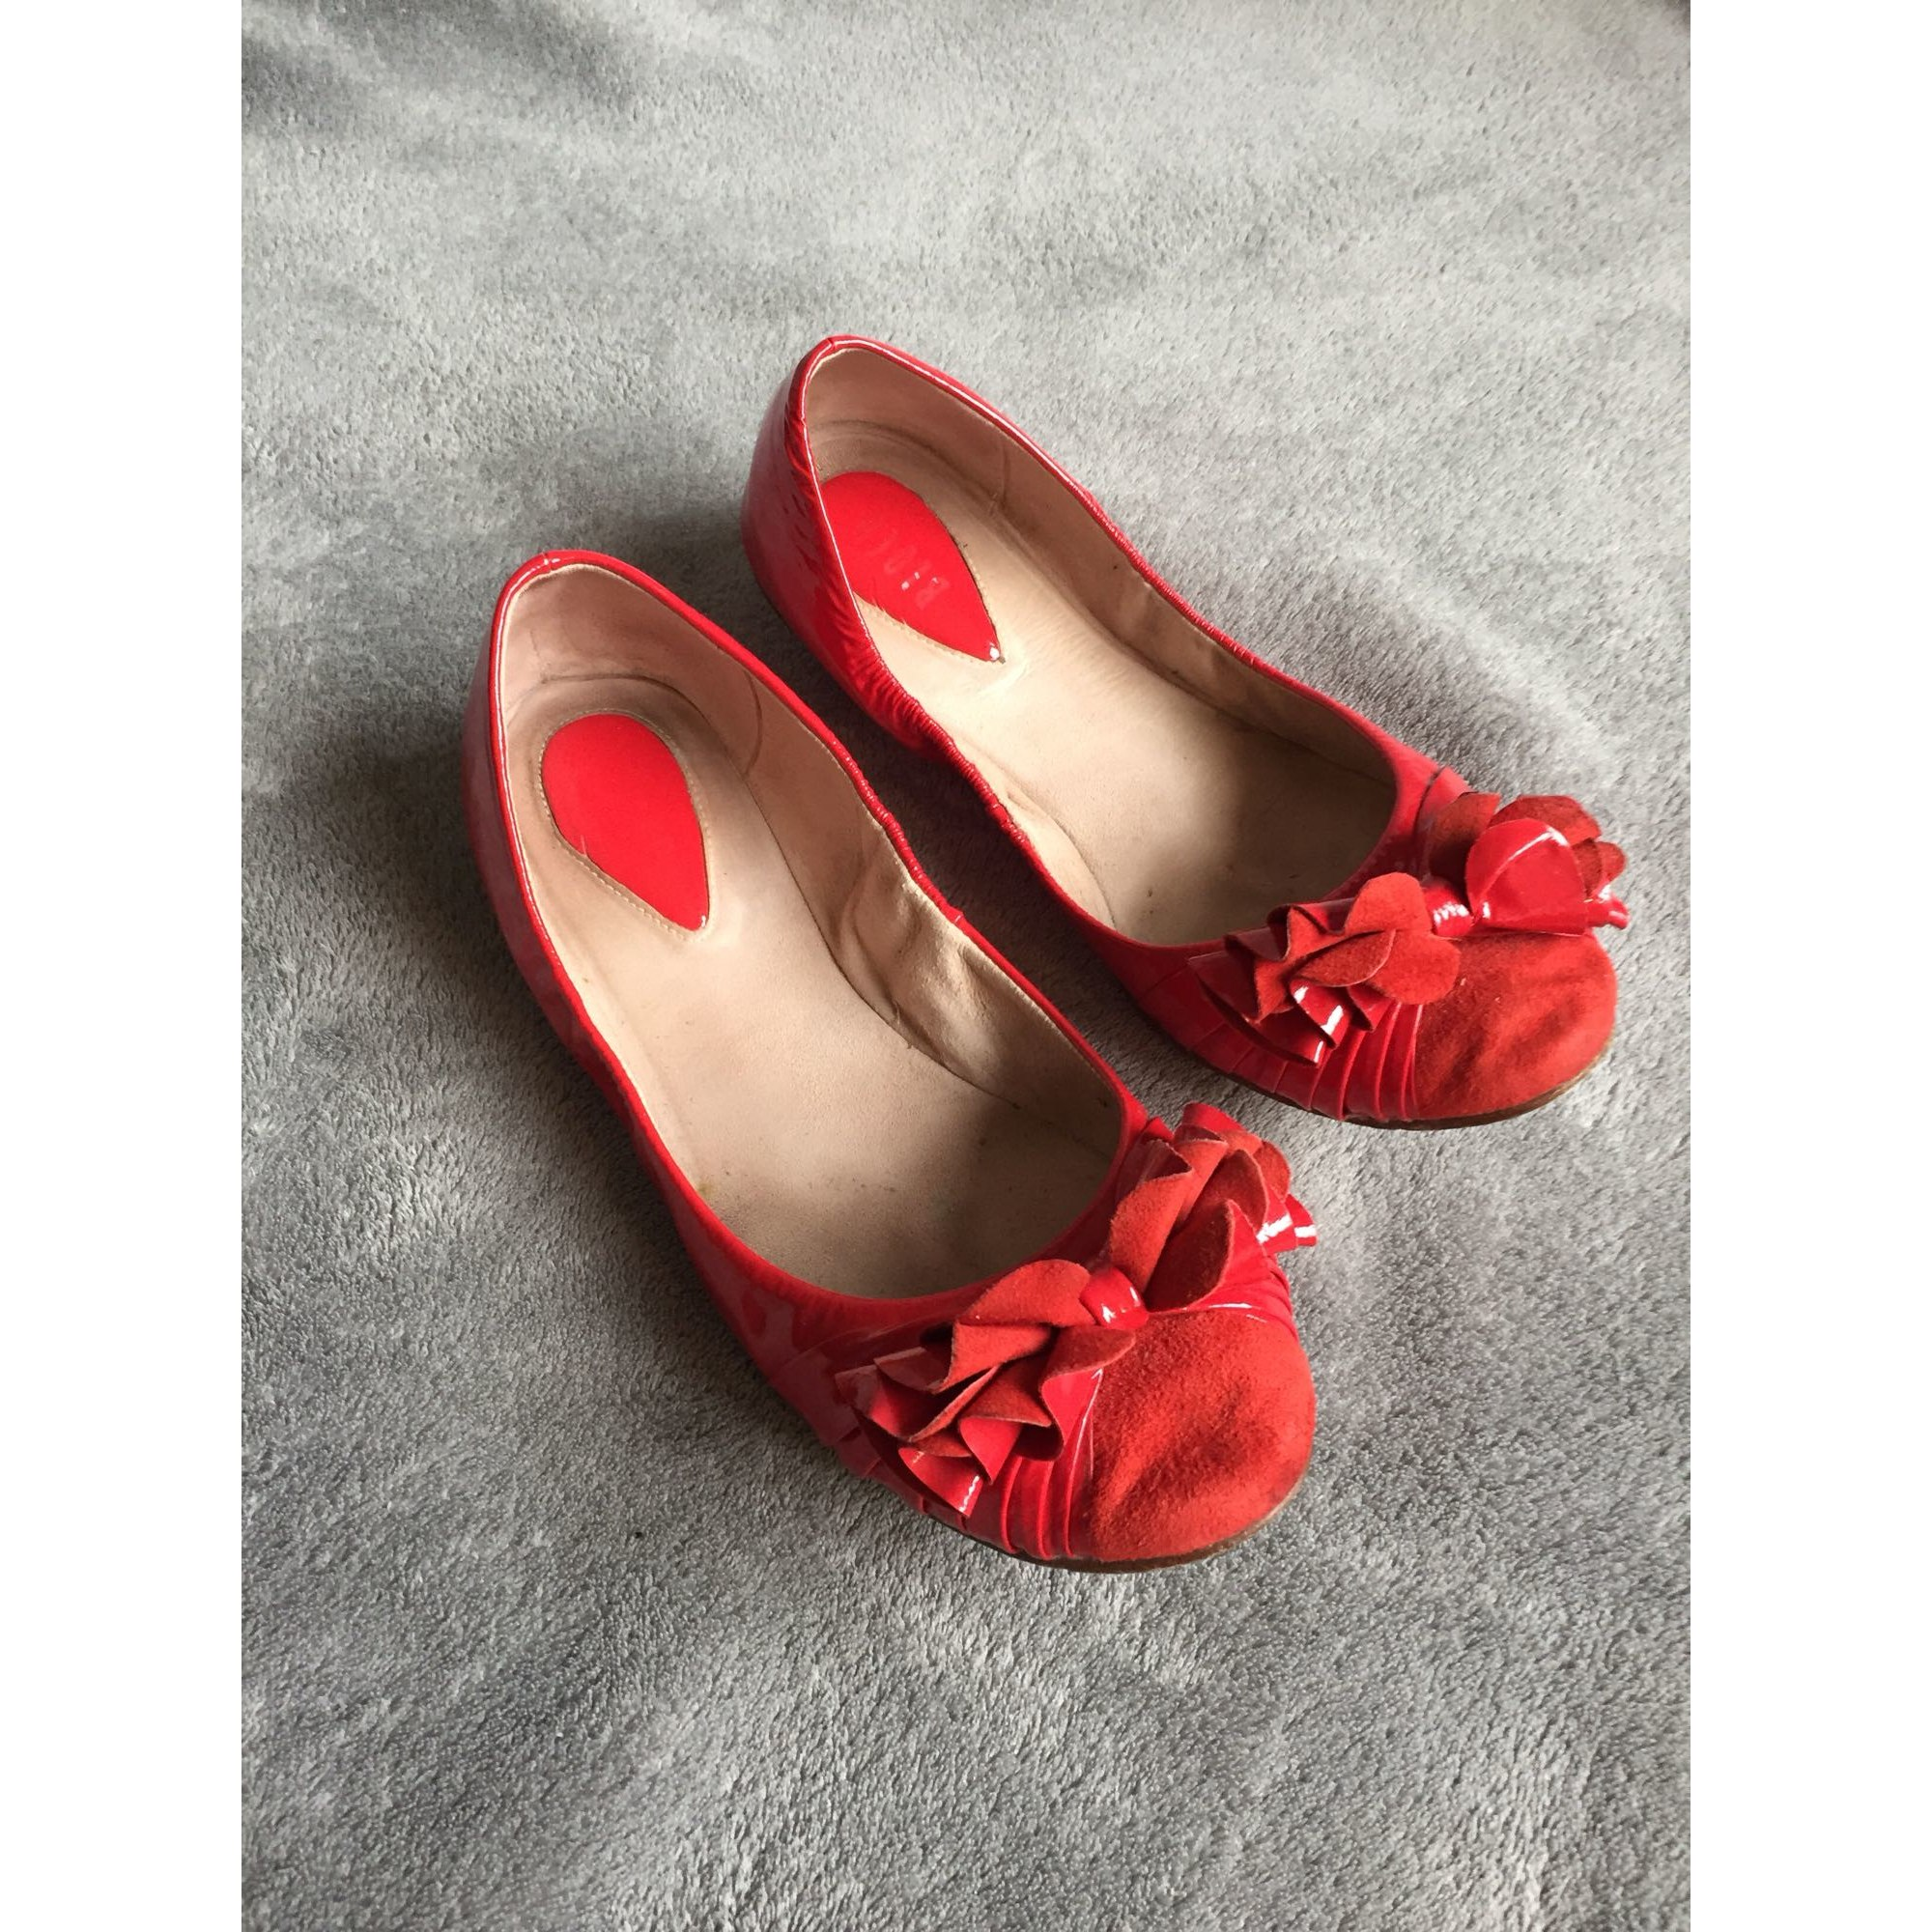 Ballerines BLOCH Rouge, bordeaux